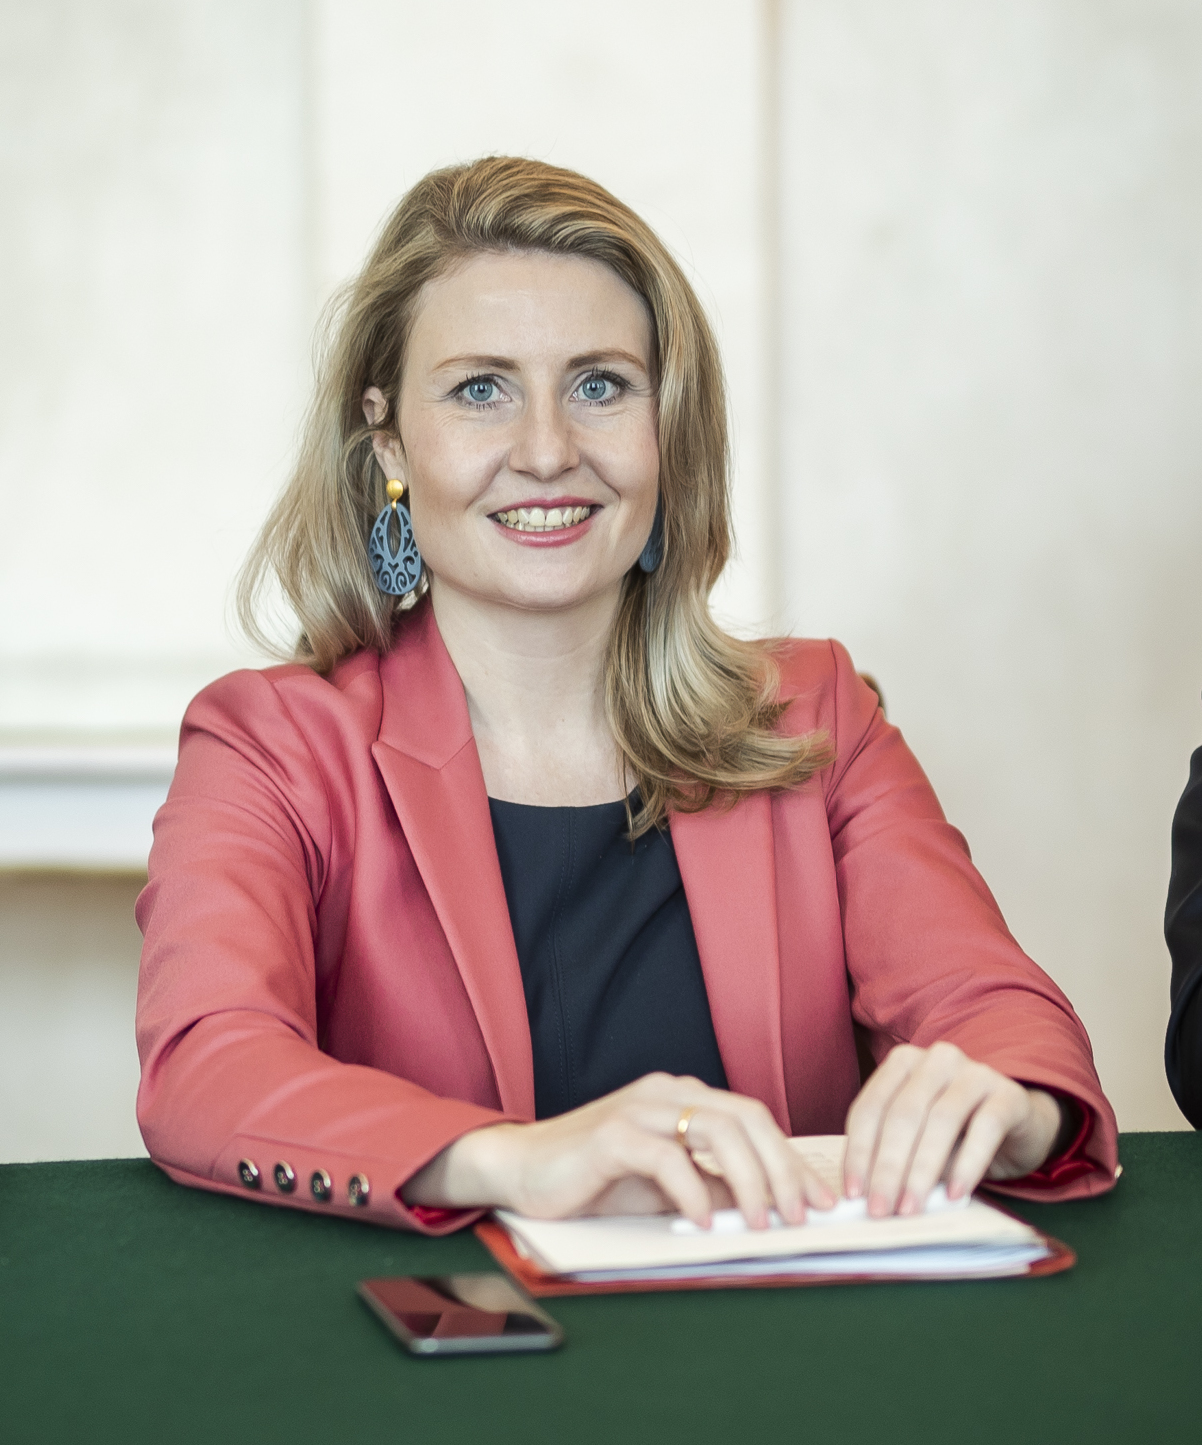 2020 Susanne Raab Ministerrat am 8.1.2020 49351571192 cropped